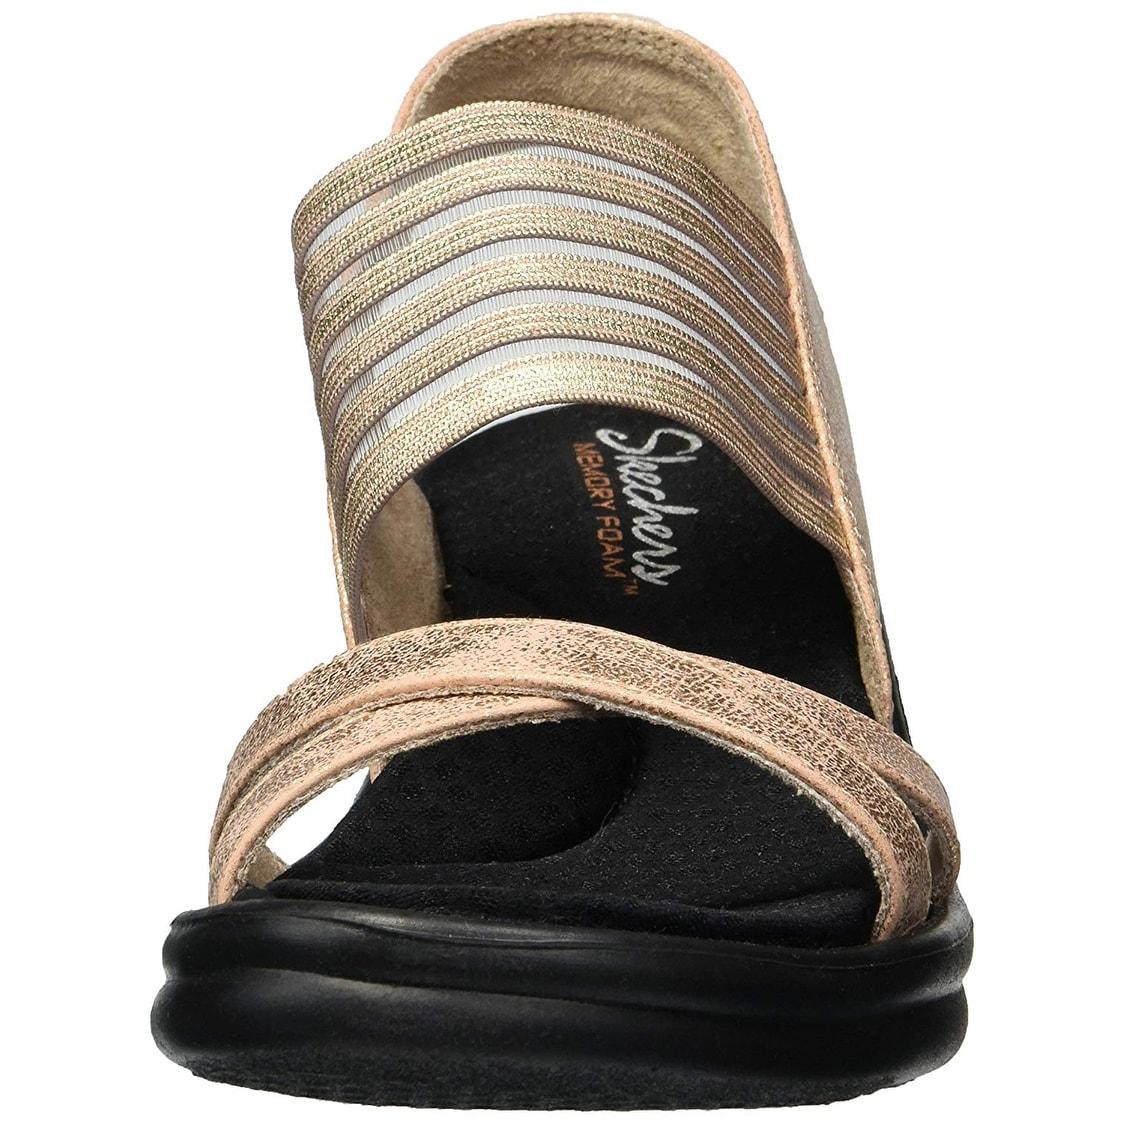 fff74df0d6f Shop Skechers Cali Women s Rumblers-Glam Society Wedge Sandal